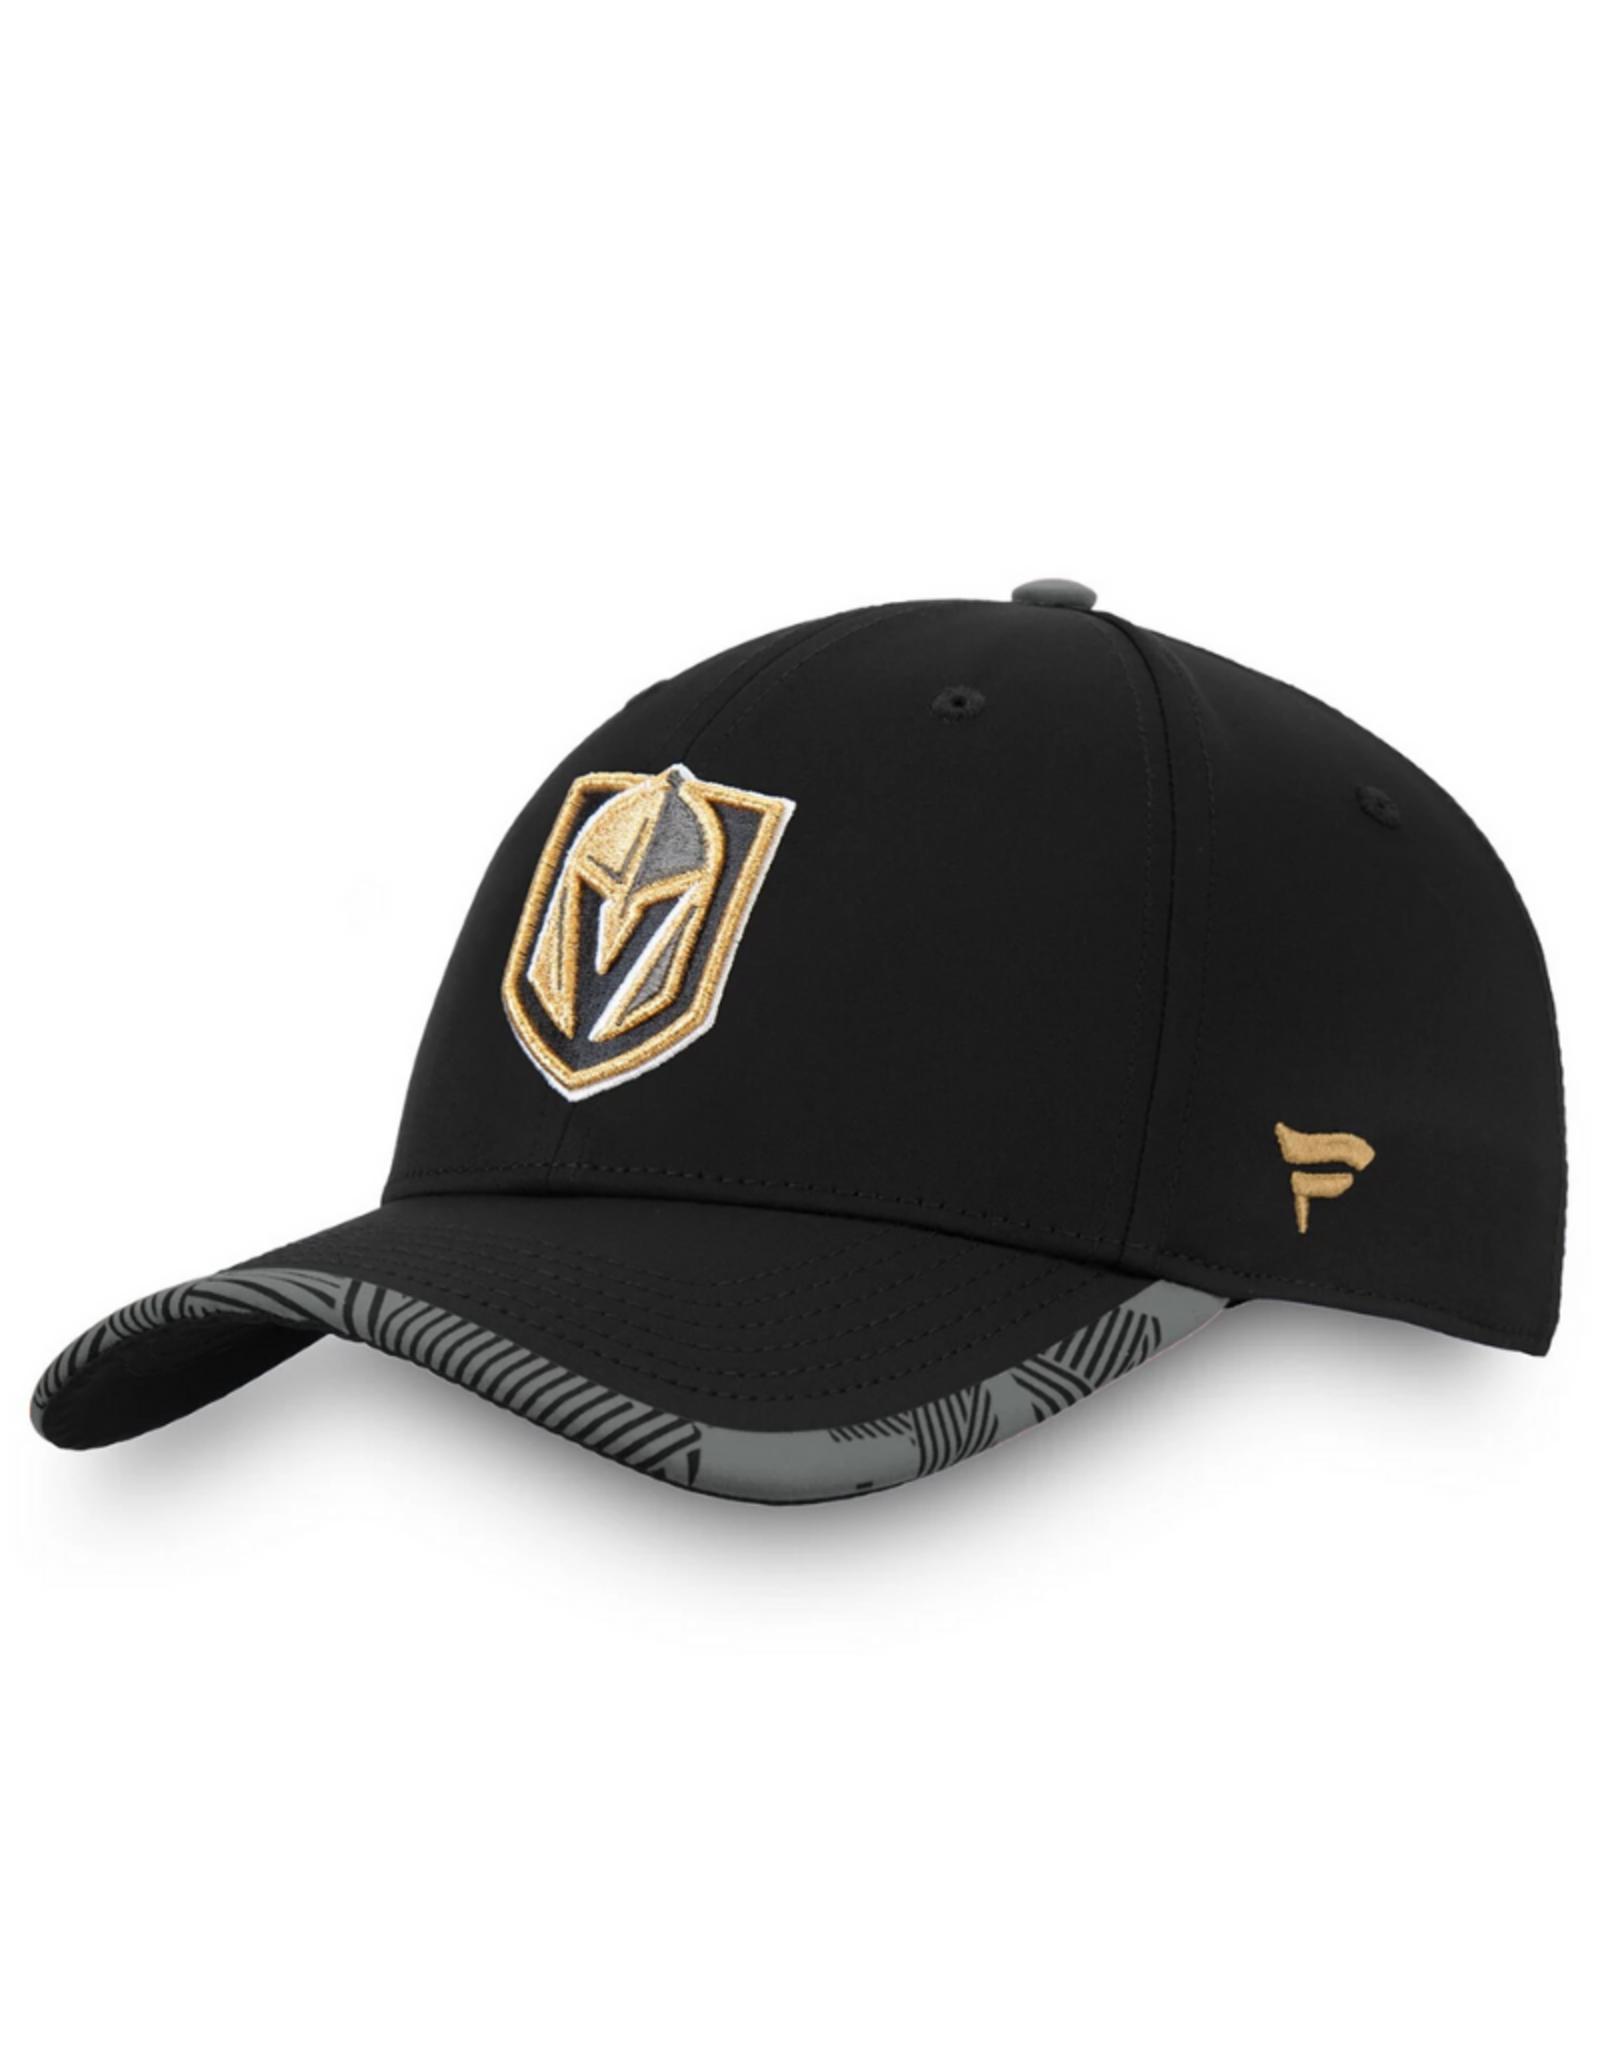 Fanatics Fanatics Men's Iconic Stretch Hat Vegas Golden Knights Black